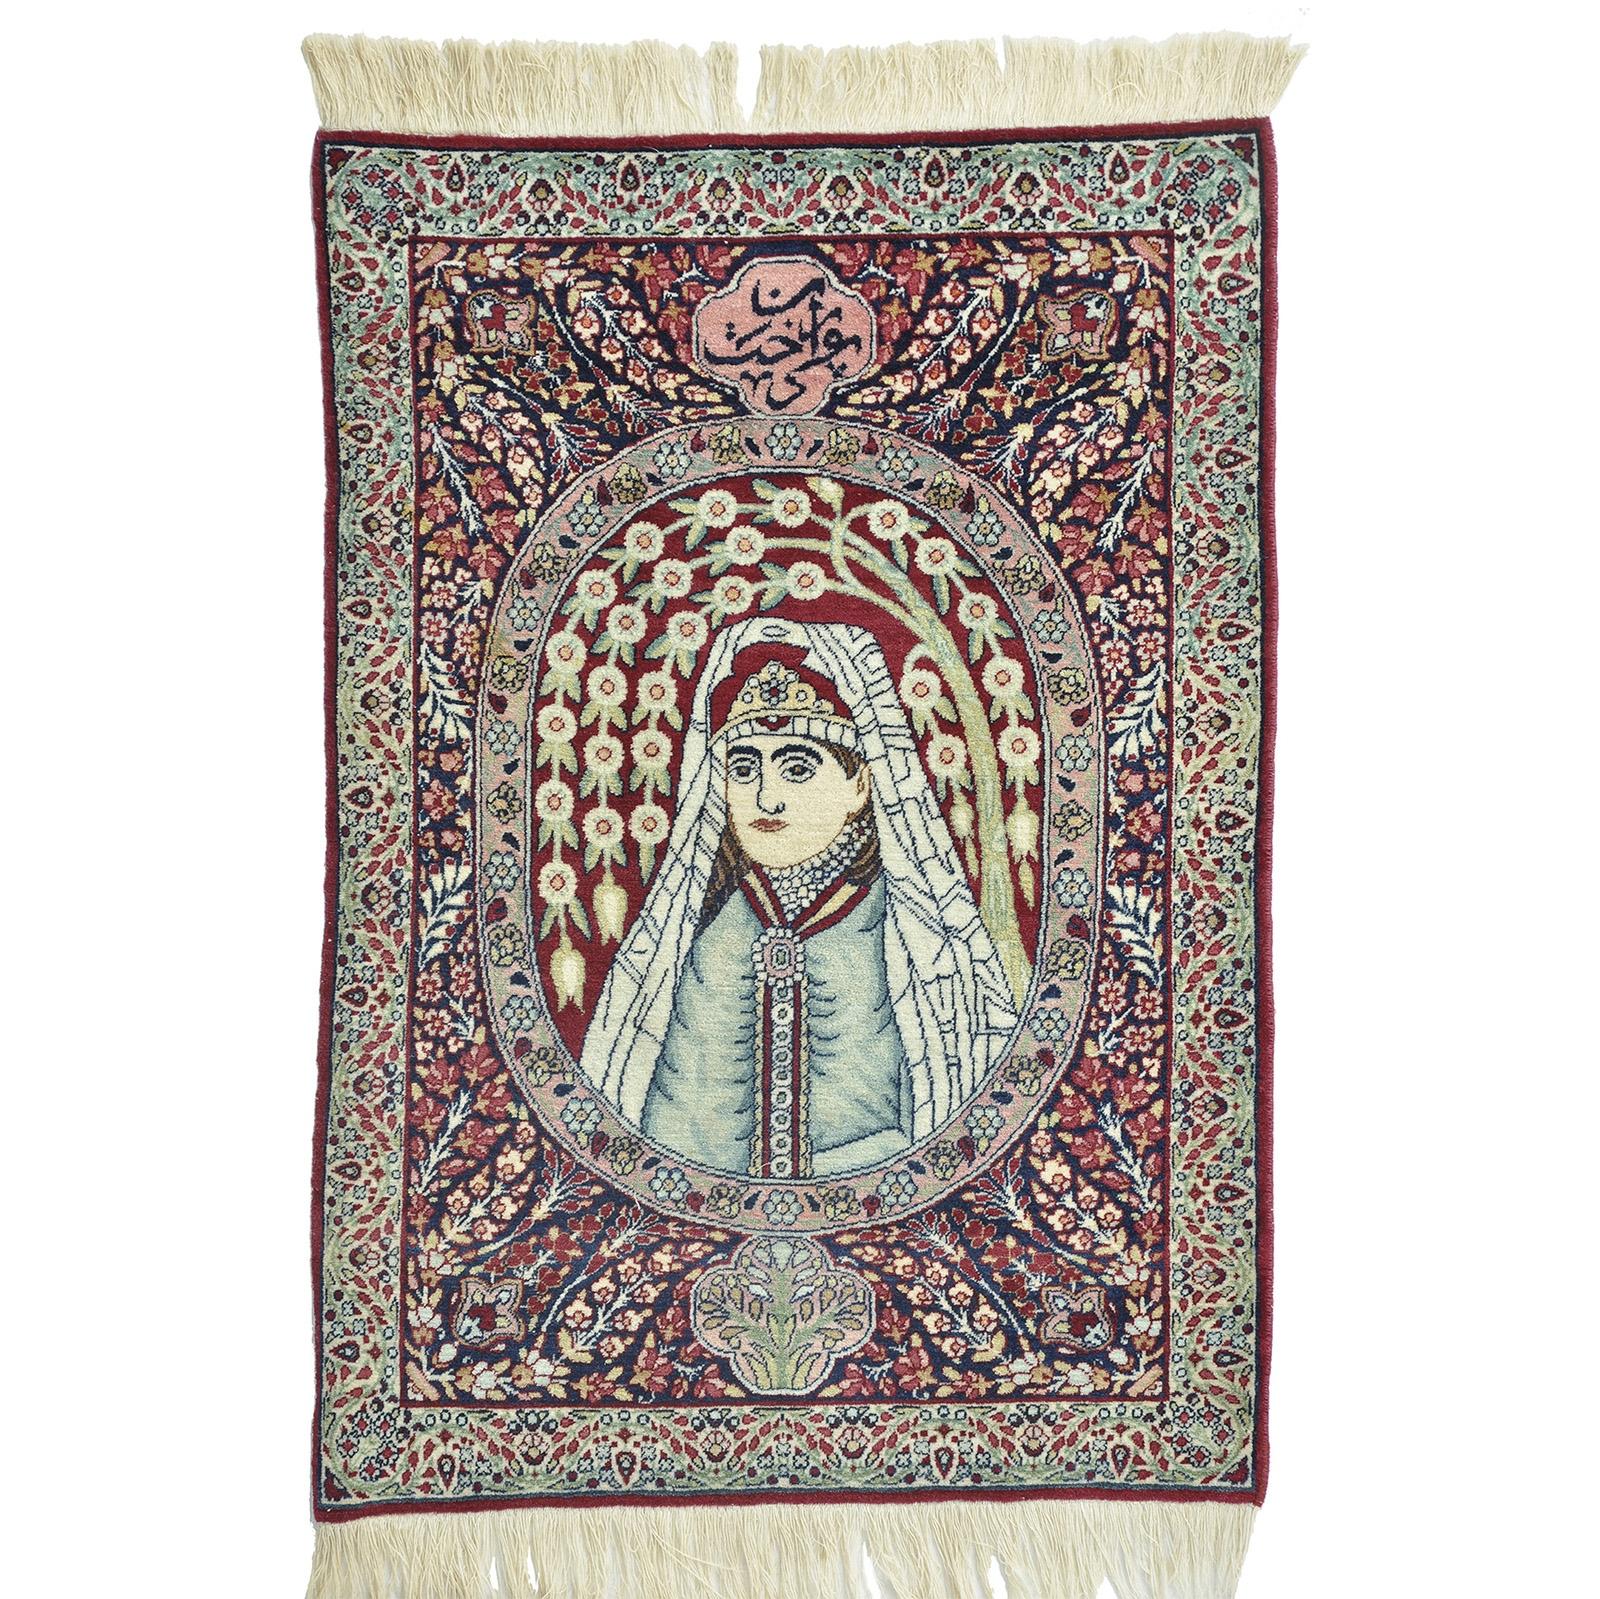 Kerman (Antik) matta storlek 93x62 cm